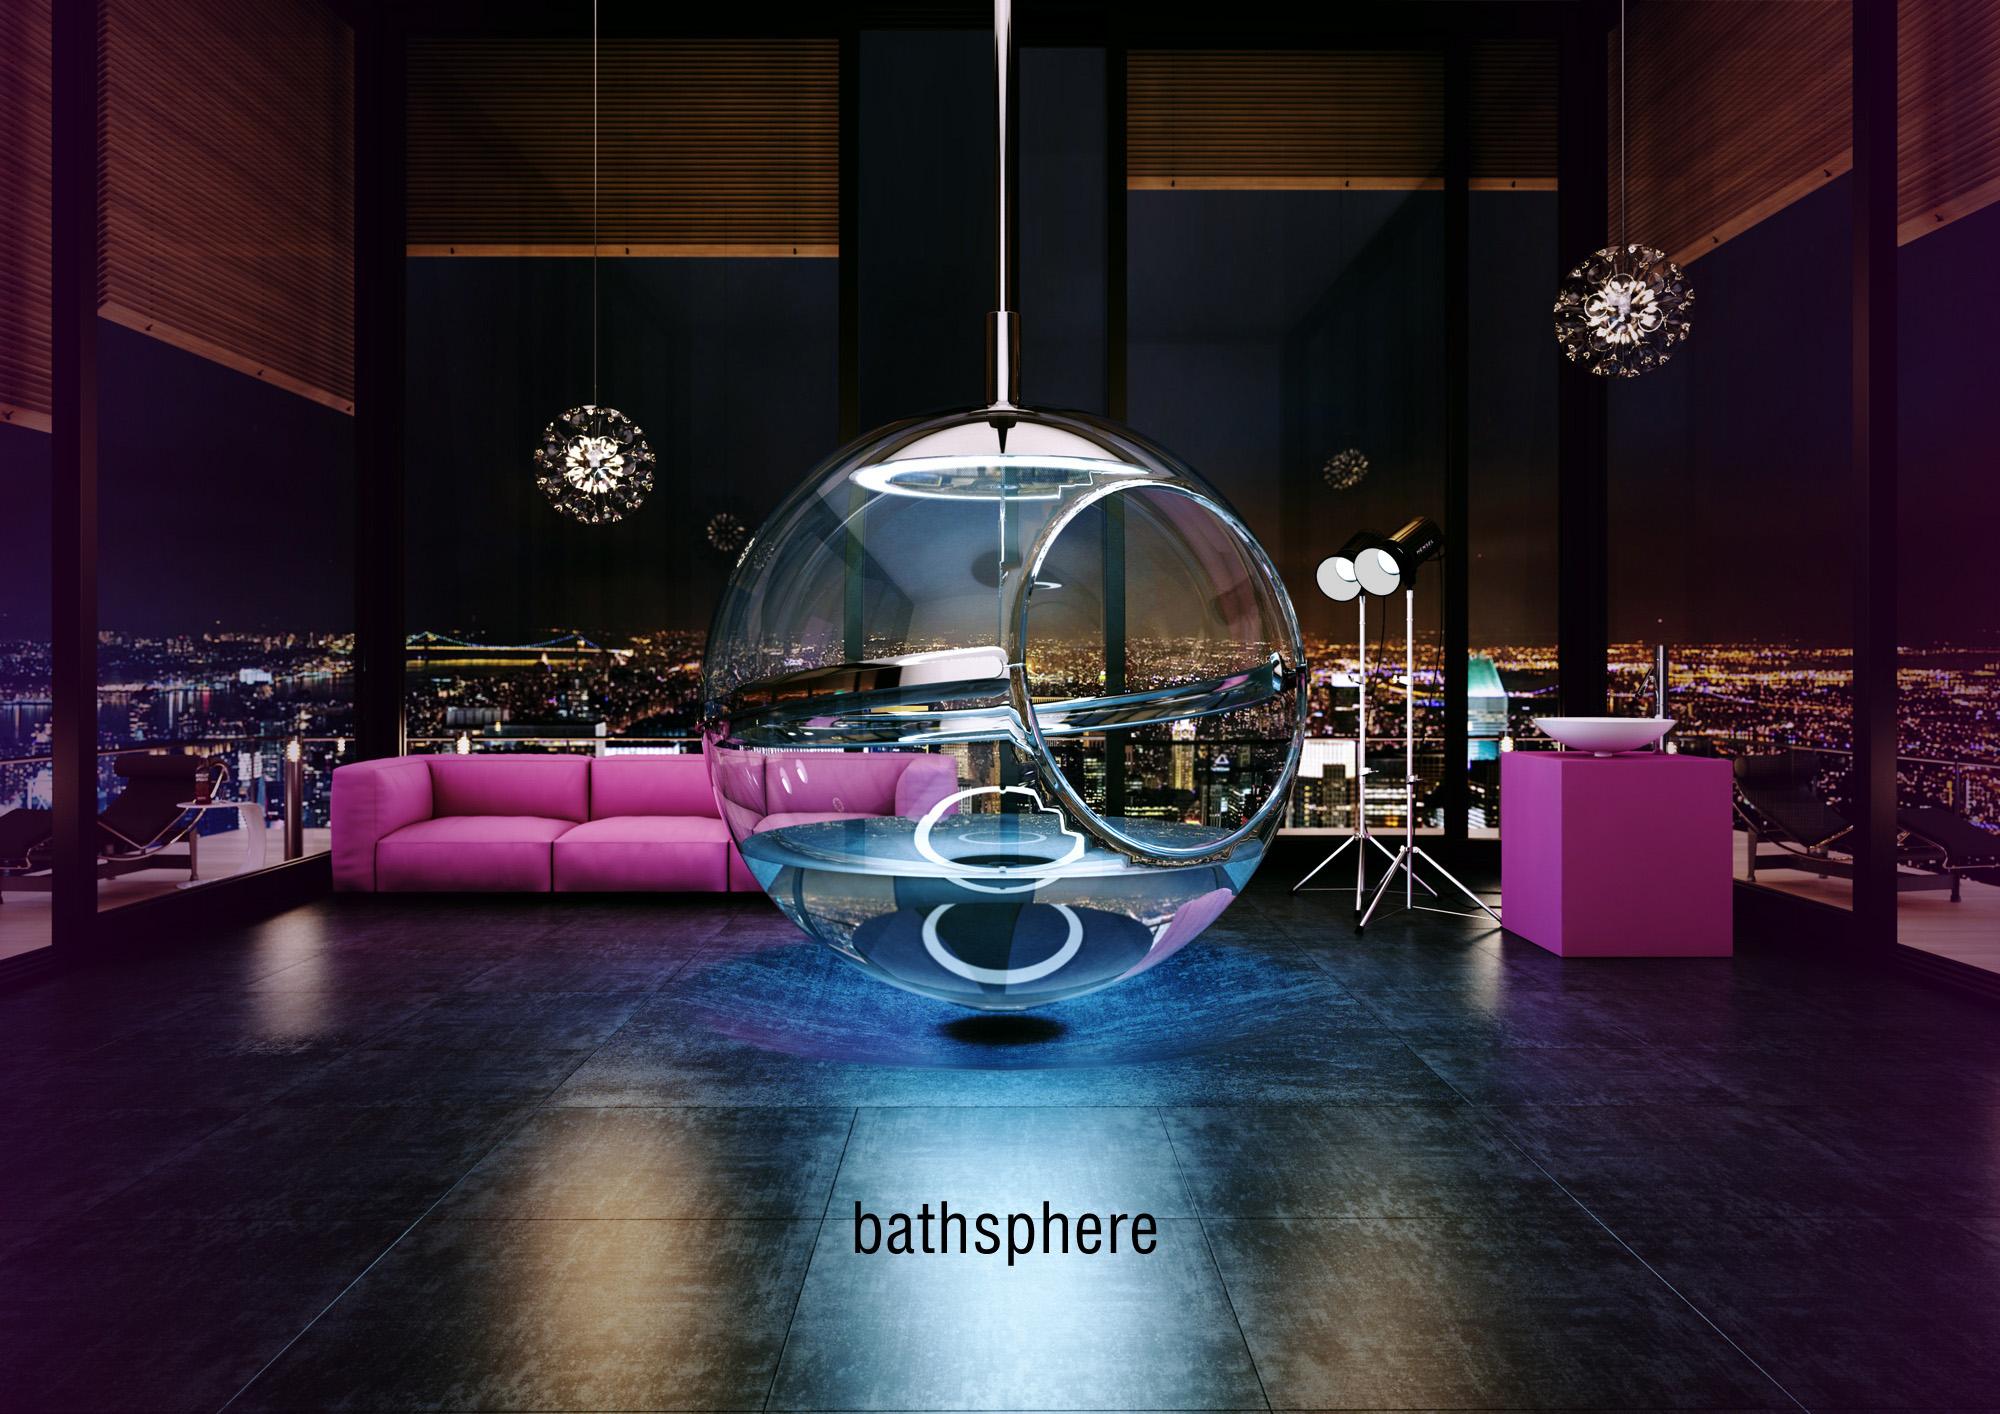 Glass Bathsphere, the Future of Bathroom Baths by Alexander Zhukovsky-01